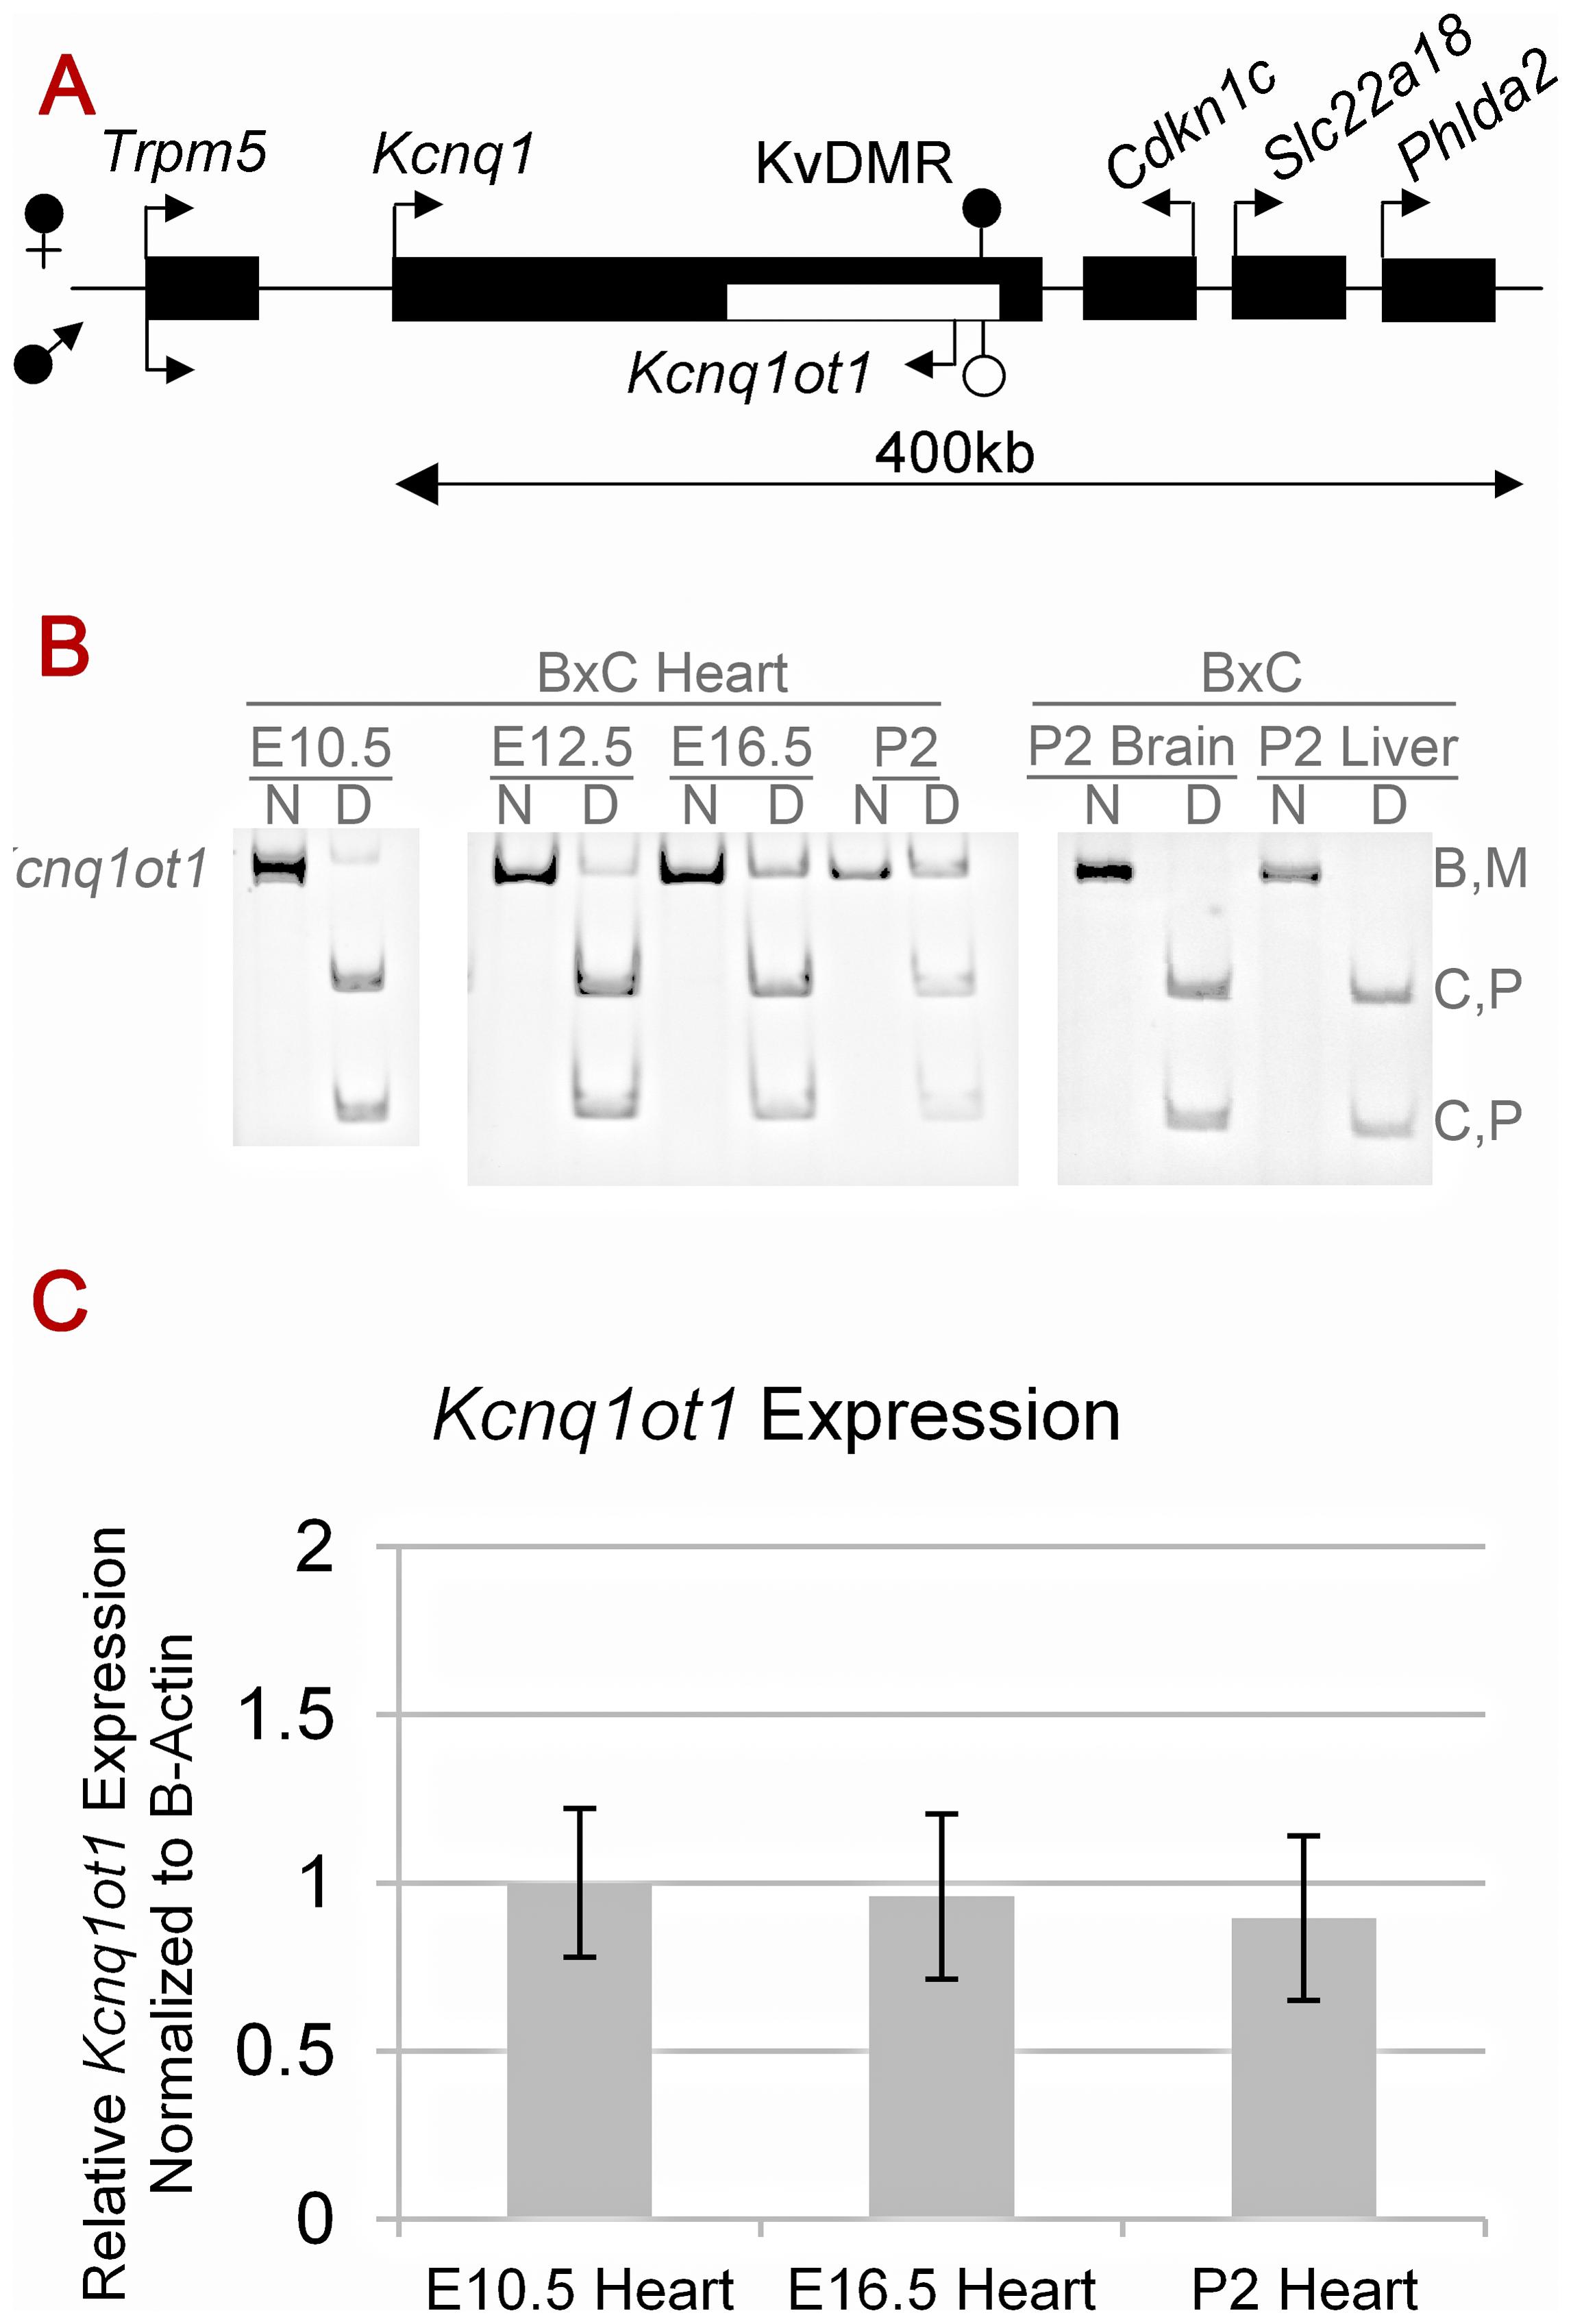 Cardiac expression profile of <i>Kcnq1ot1</i>.